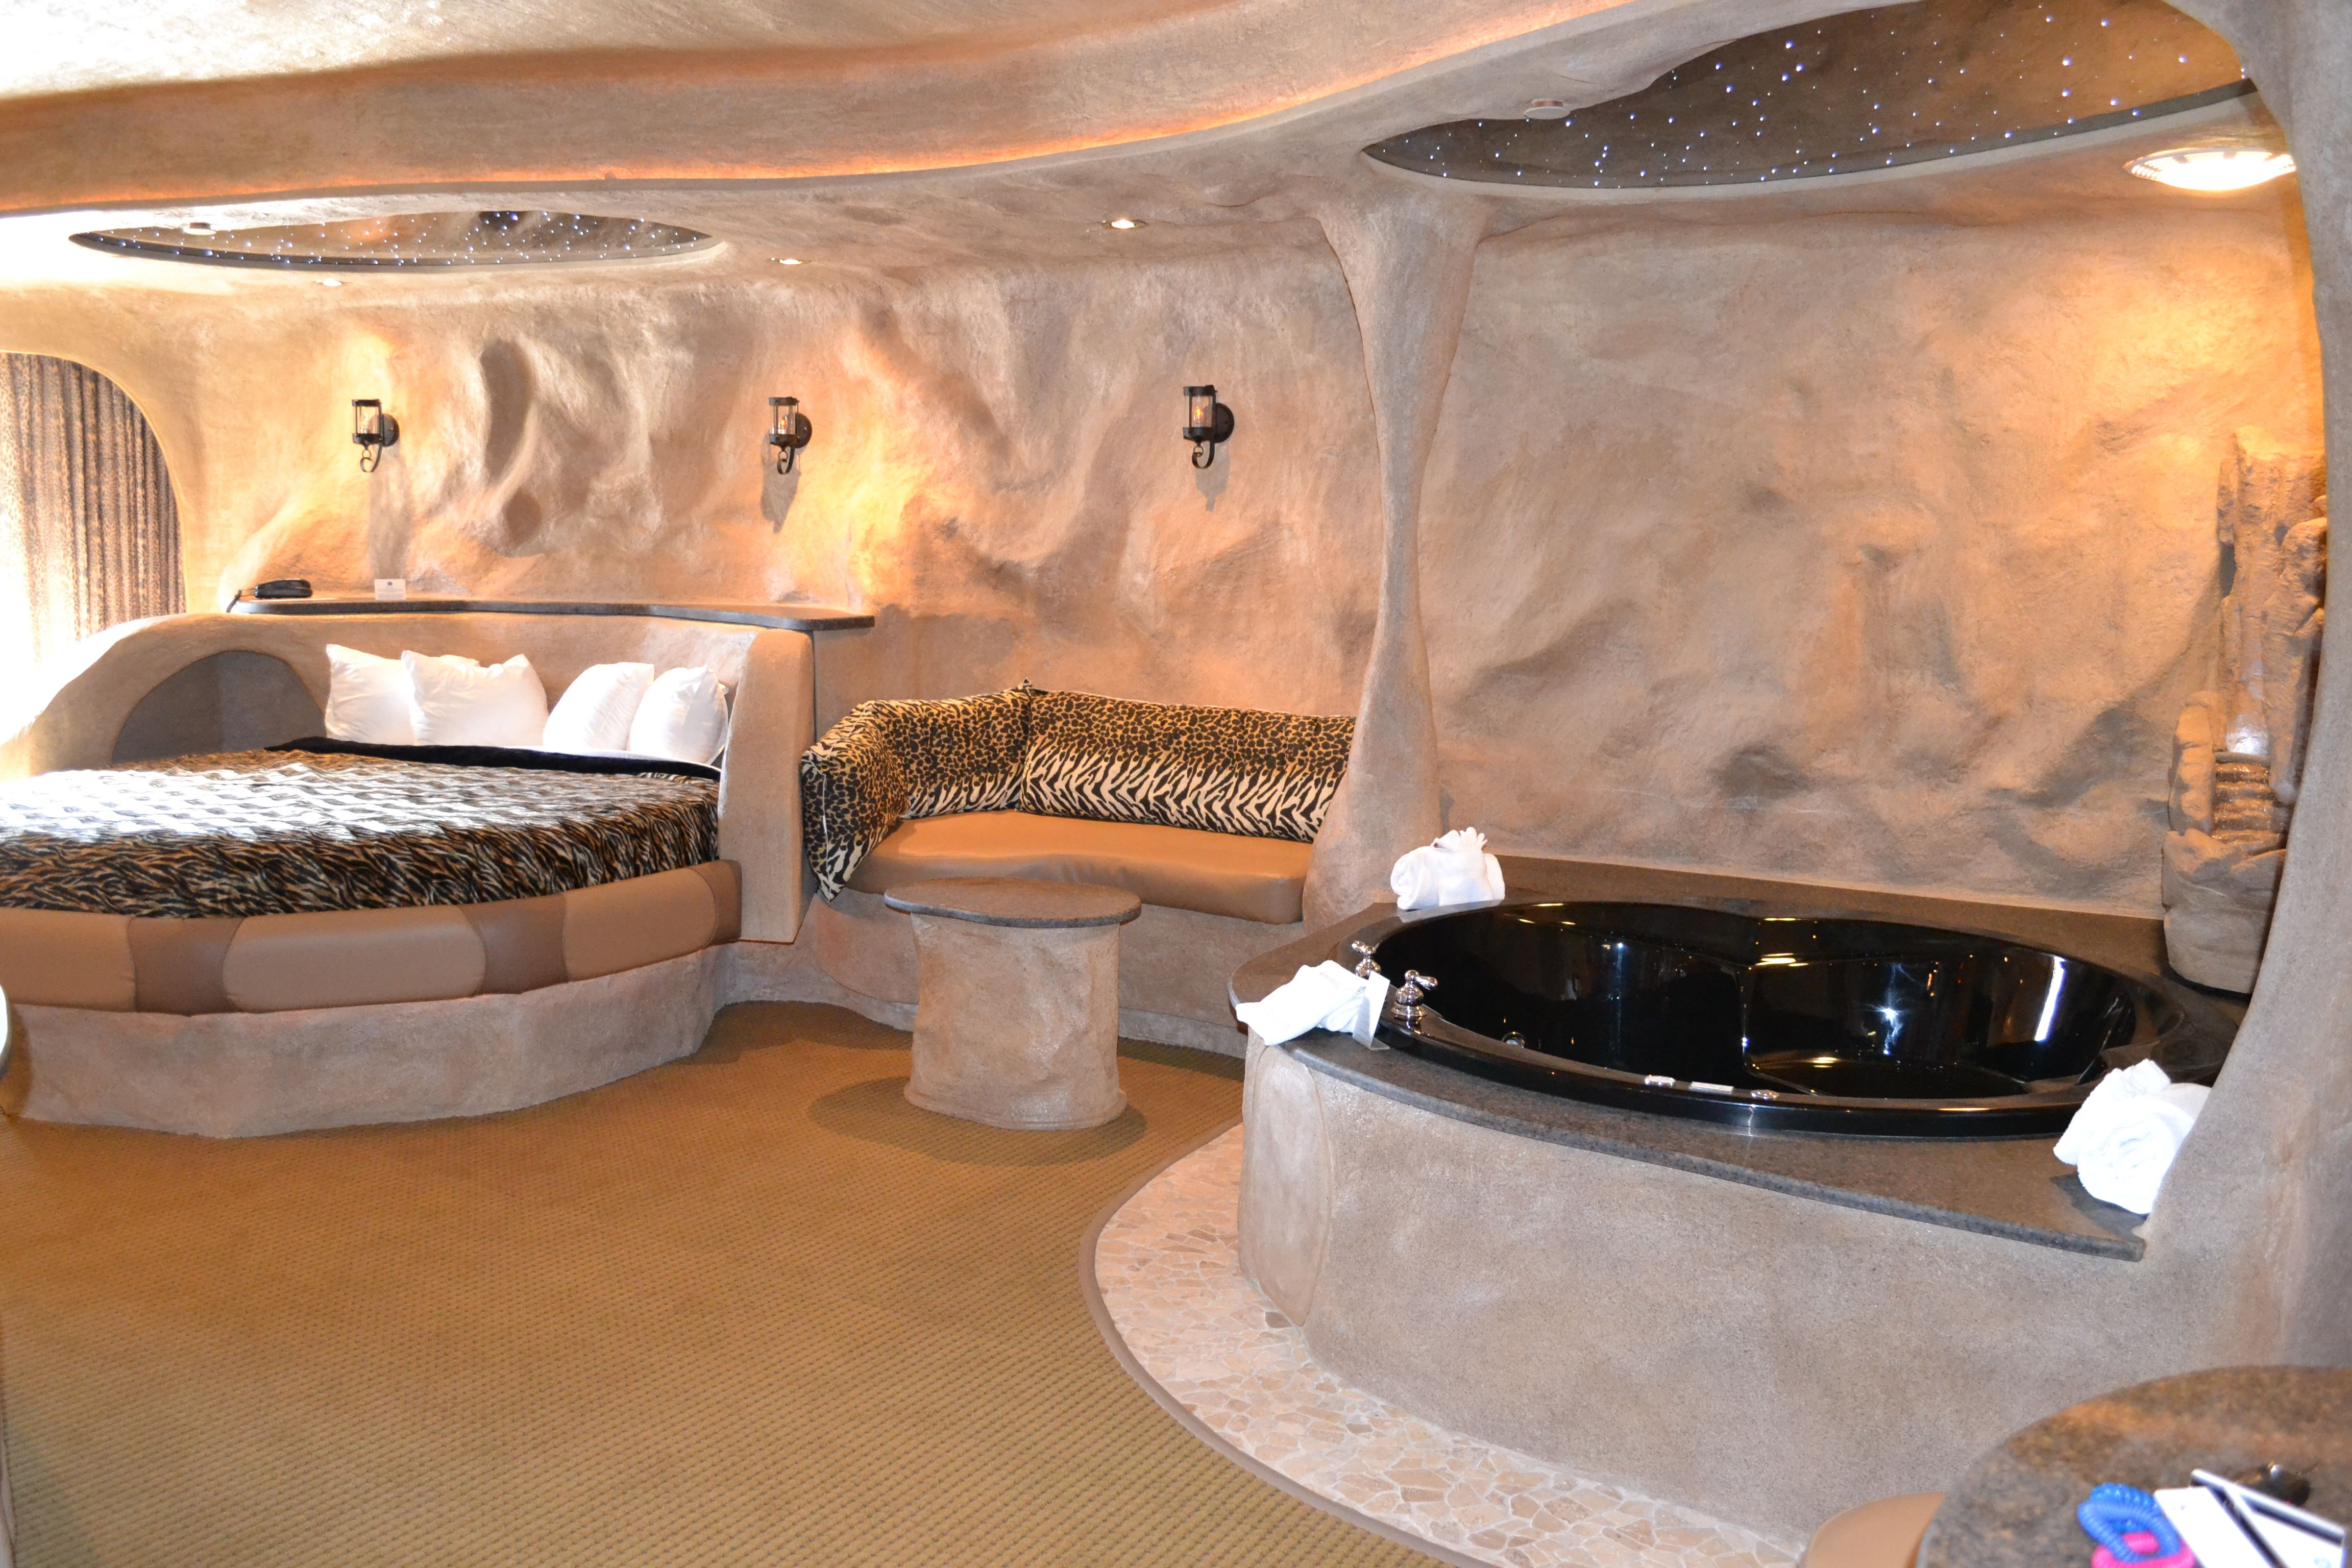 Photo of Best Western Designer Inn & Suites - Galena, IL, United States.